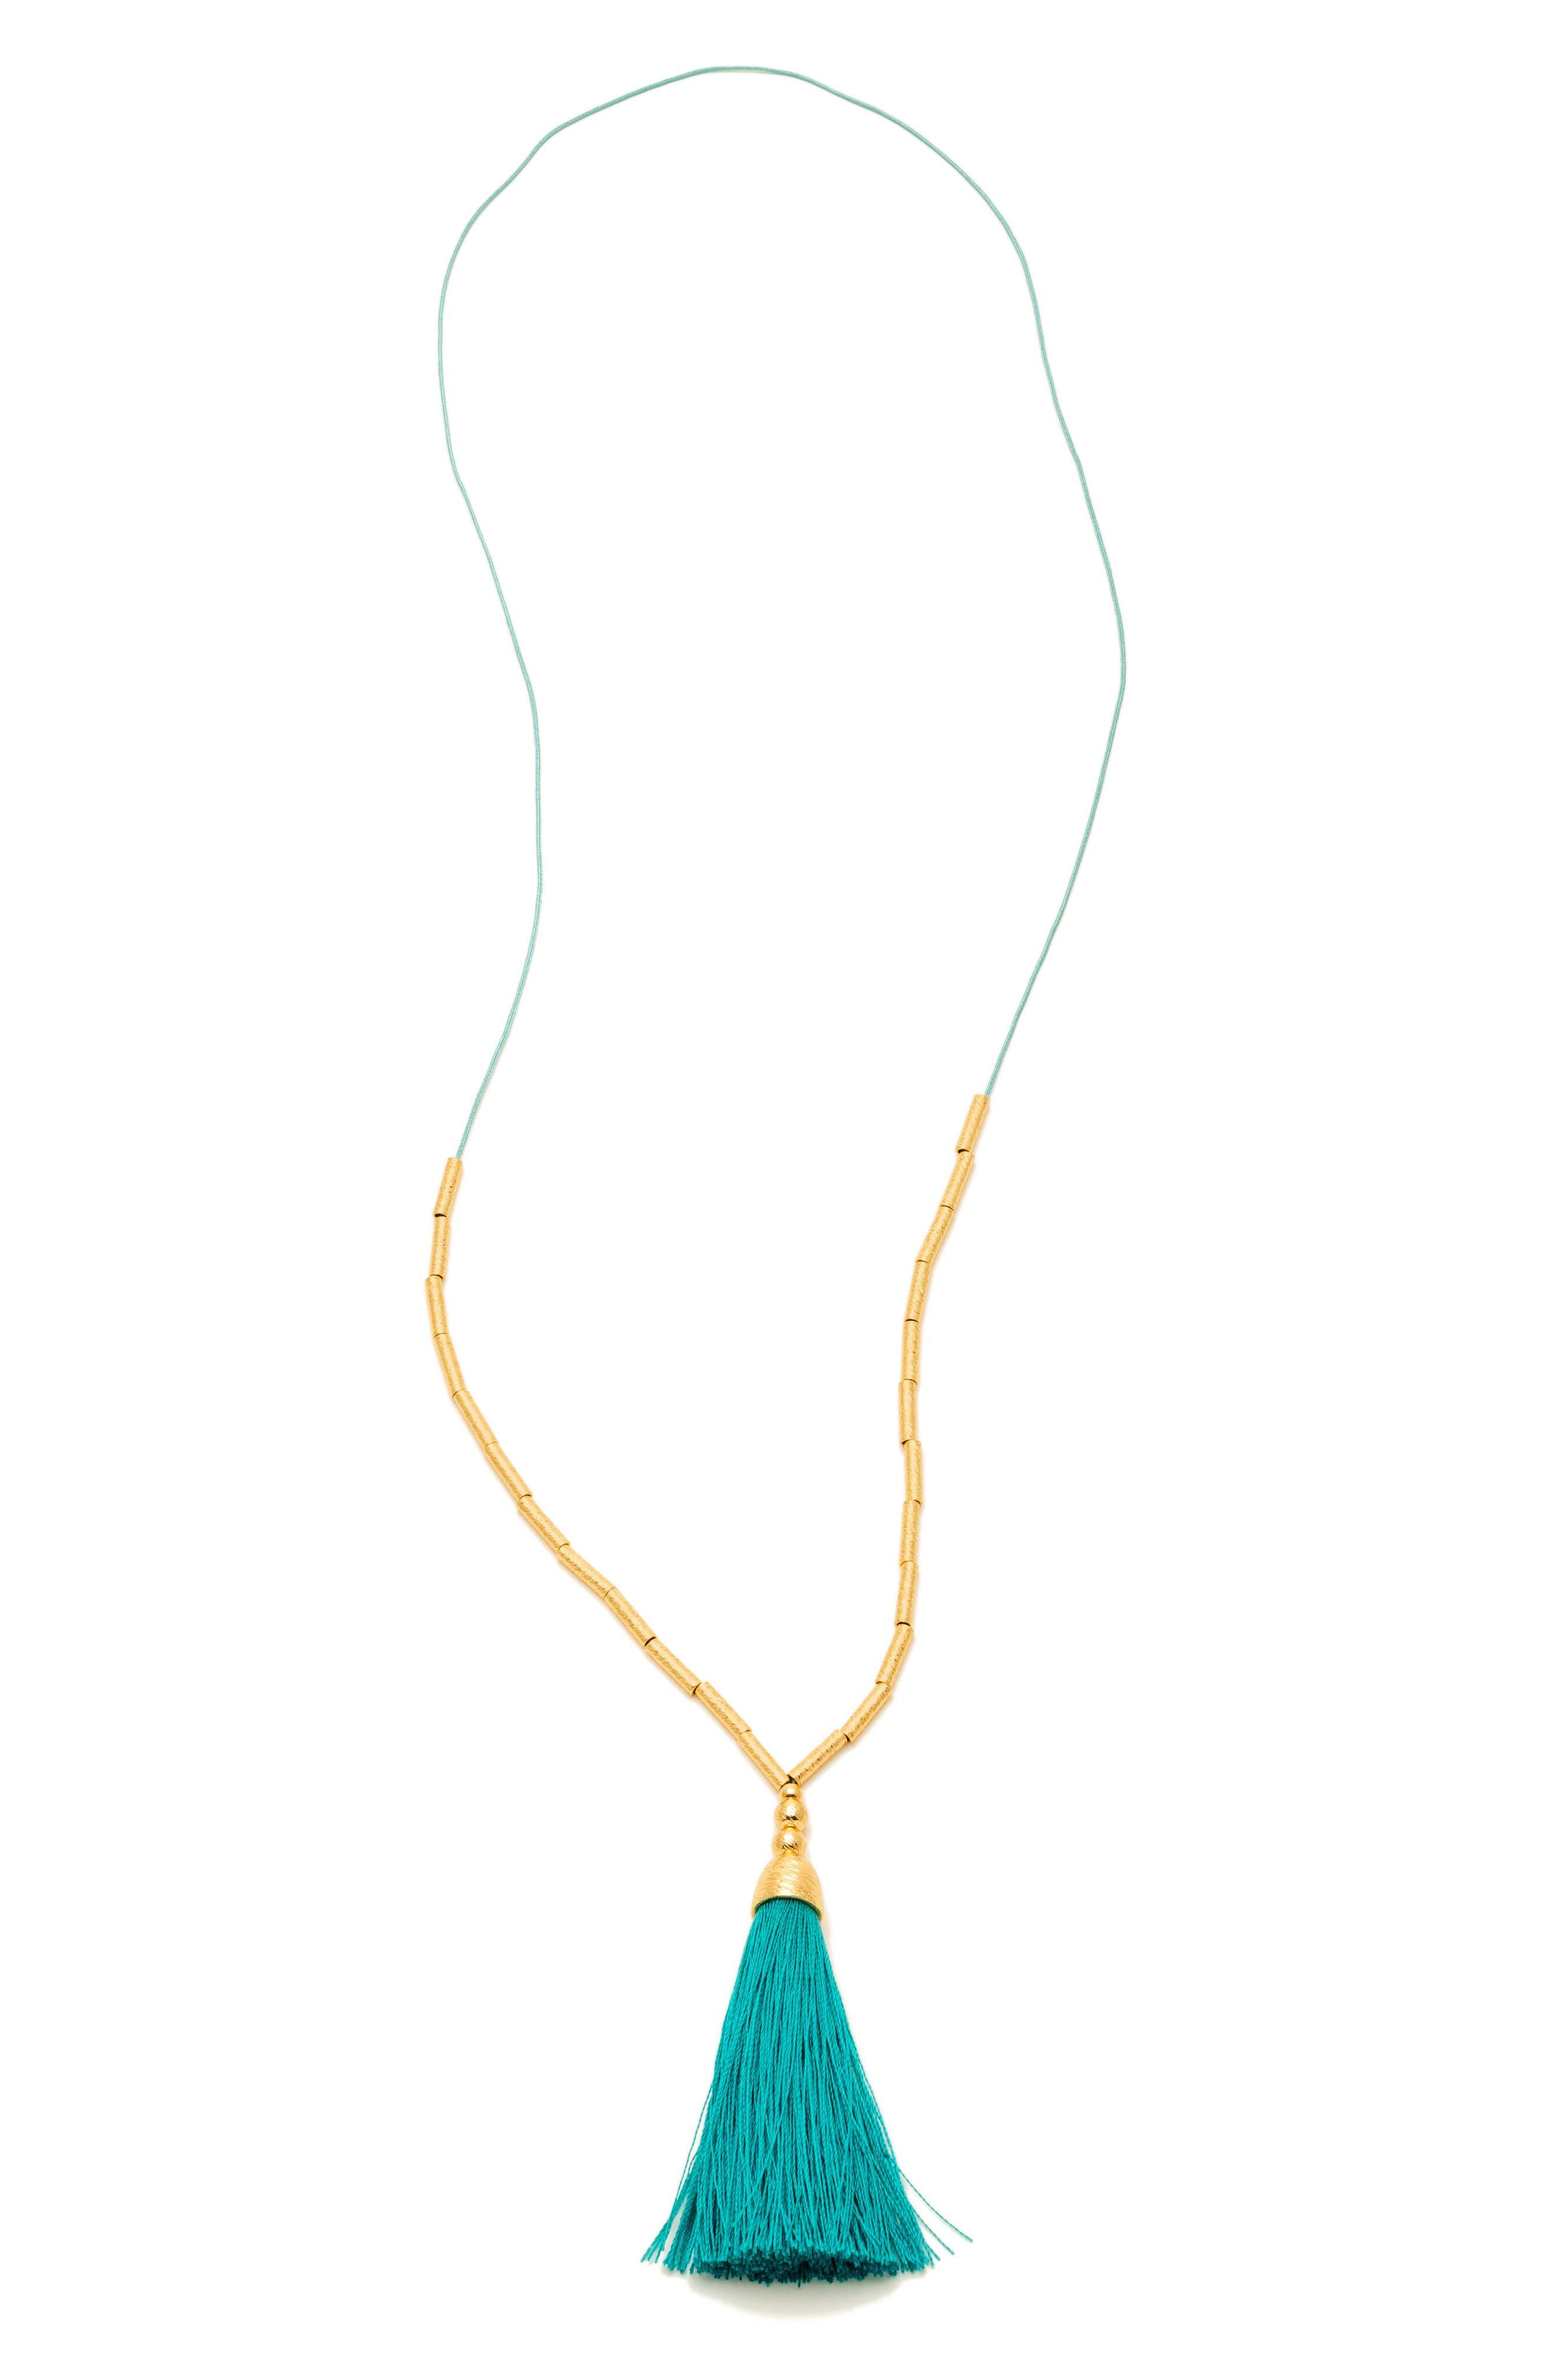 Alternate Image 1 Selected - gorjana Tulum Long Tassel Pendant Necklace